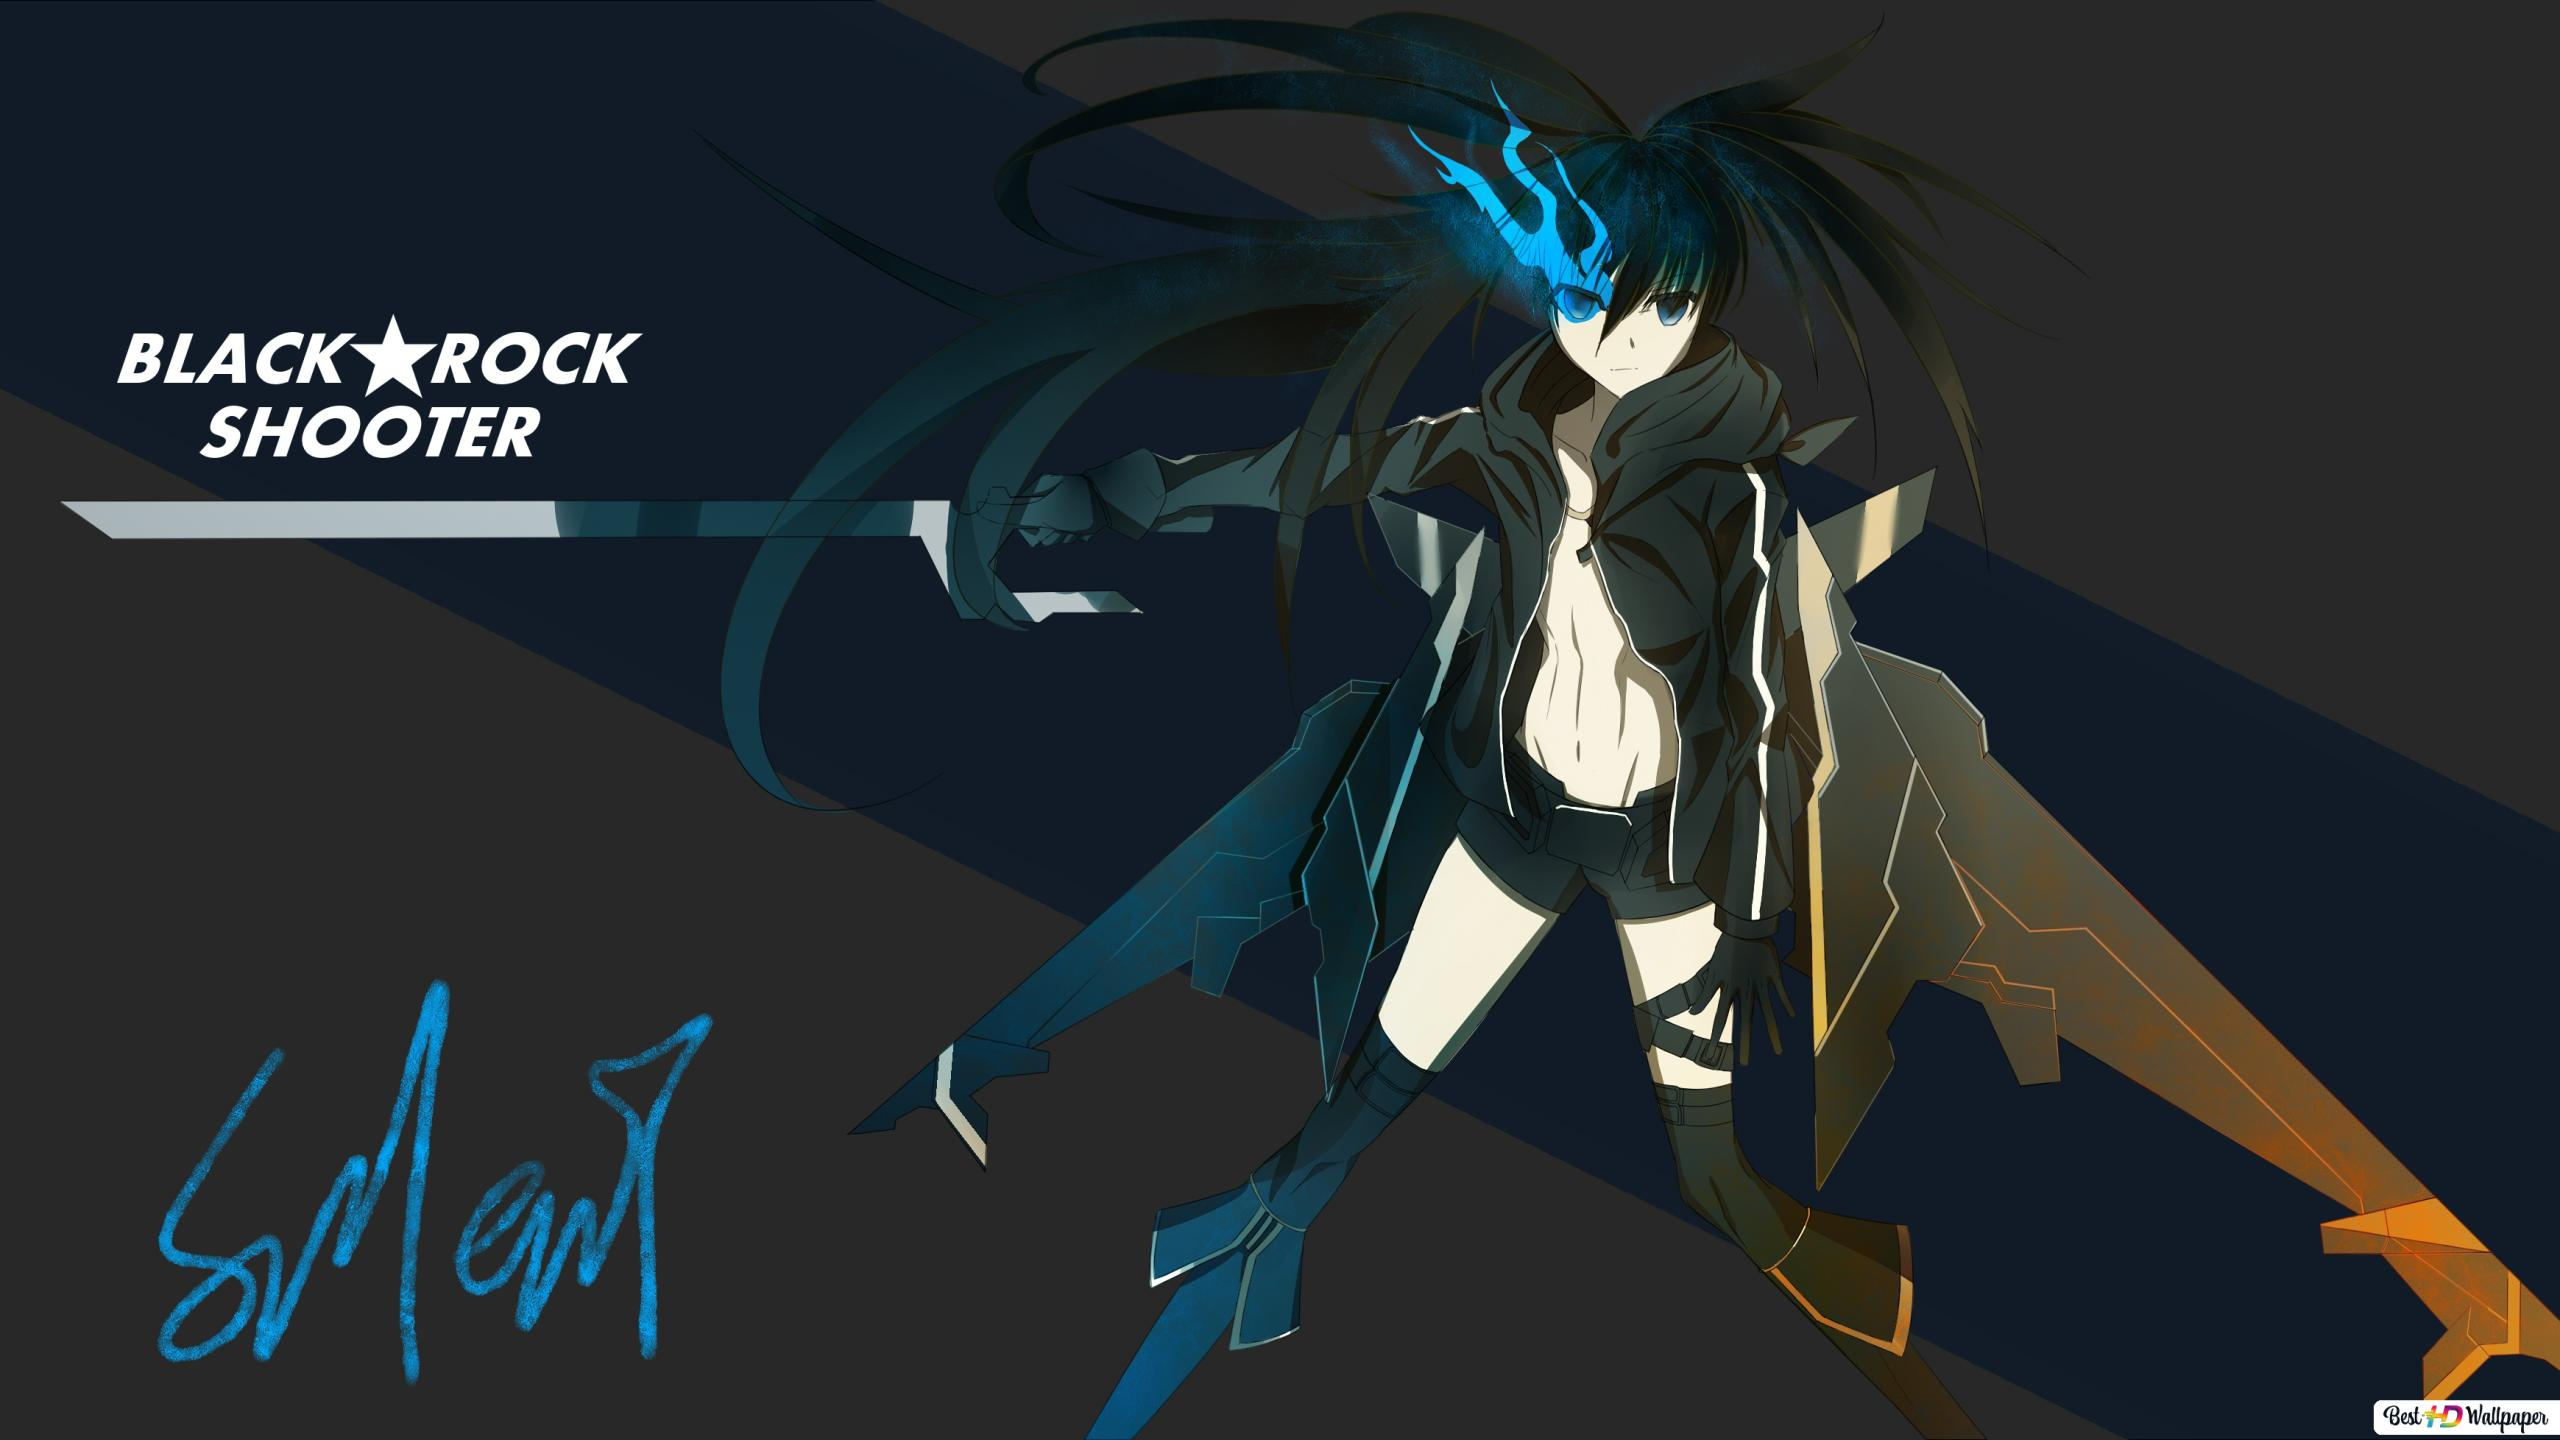 Black Rock Shooter Mato Kuroi Hd Wallpaper Download